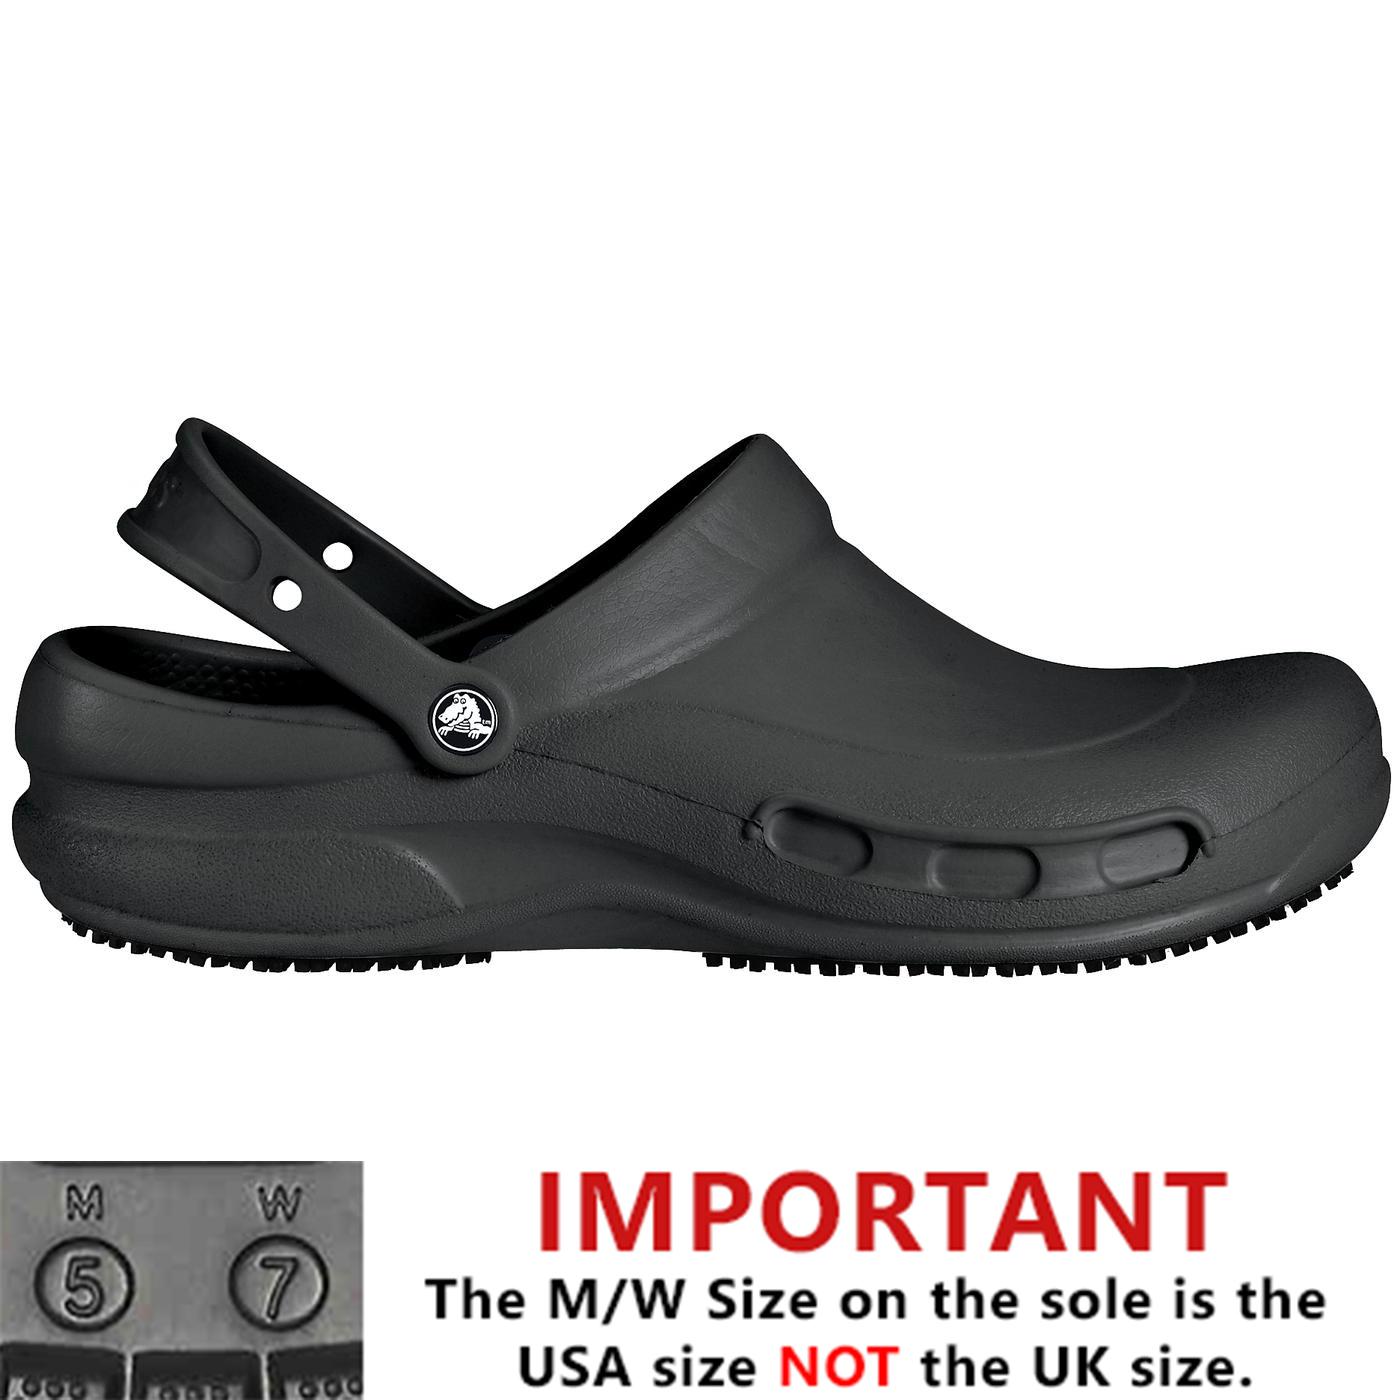 Gastro & Nahrungsmittelgewerbe Crocs Bistro Clogs Schuhe Pantoletten Arbeitsschuhe Sicherheitsclogs Clog 10075